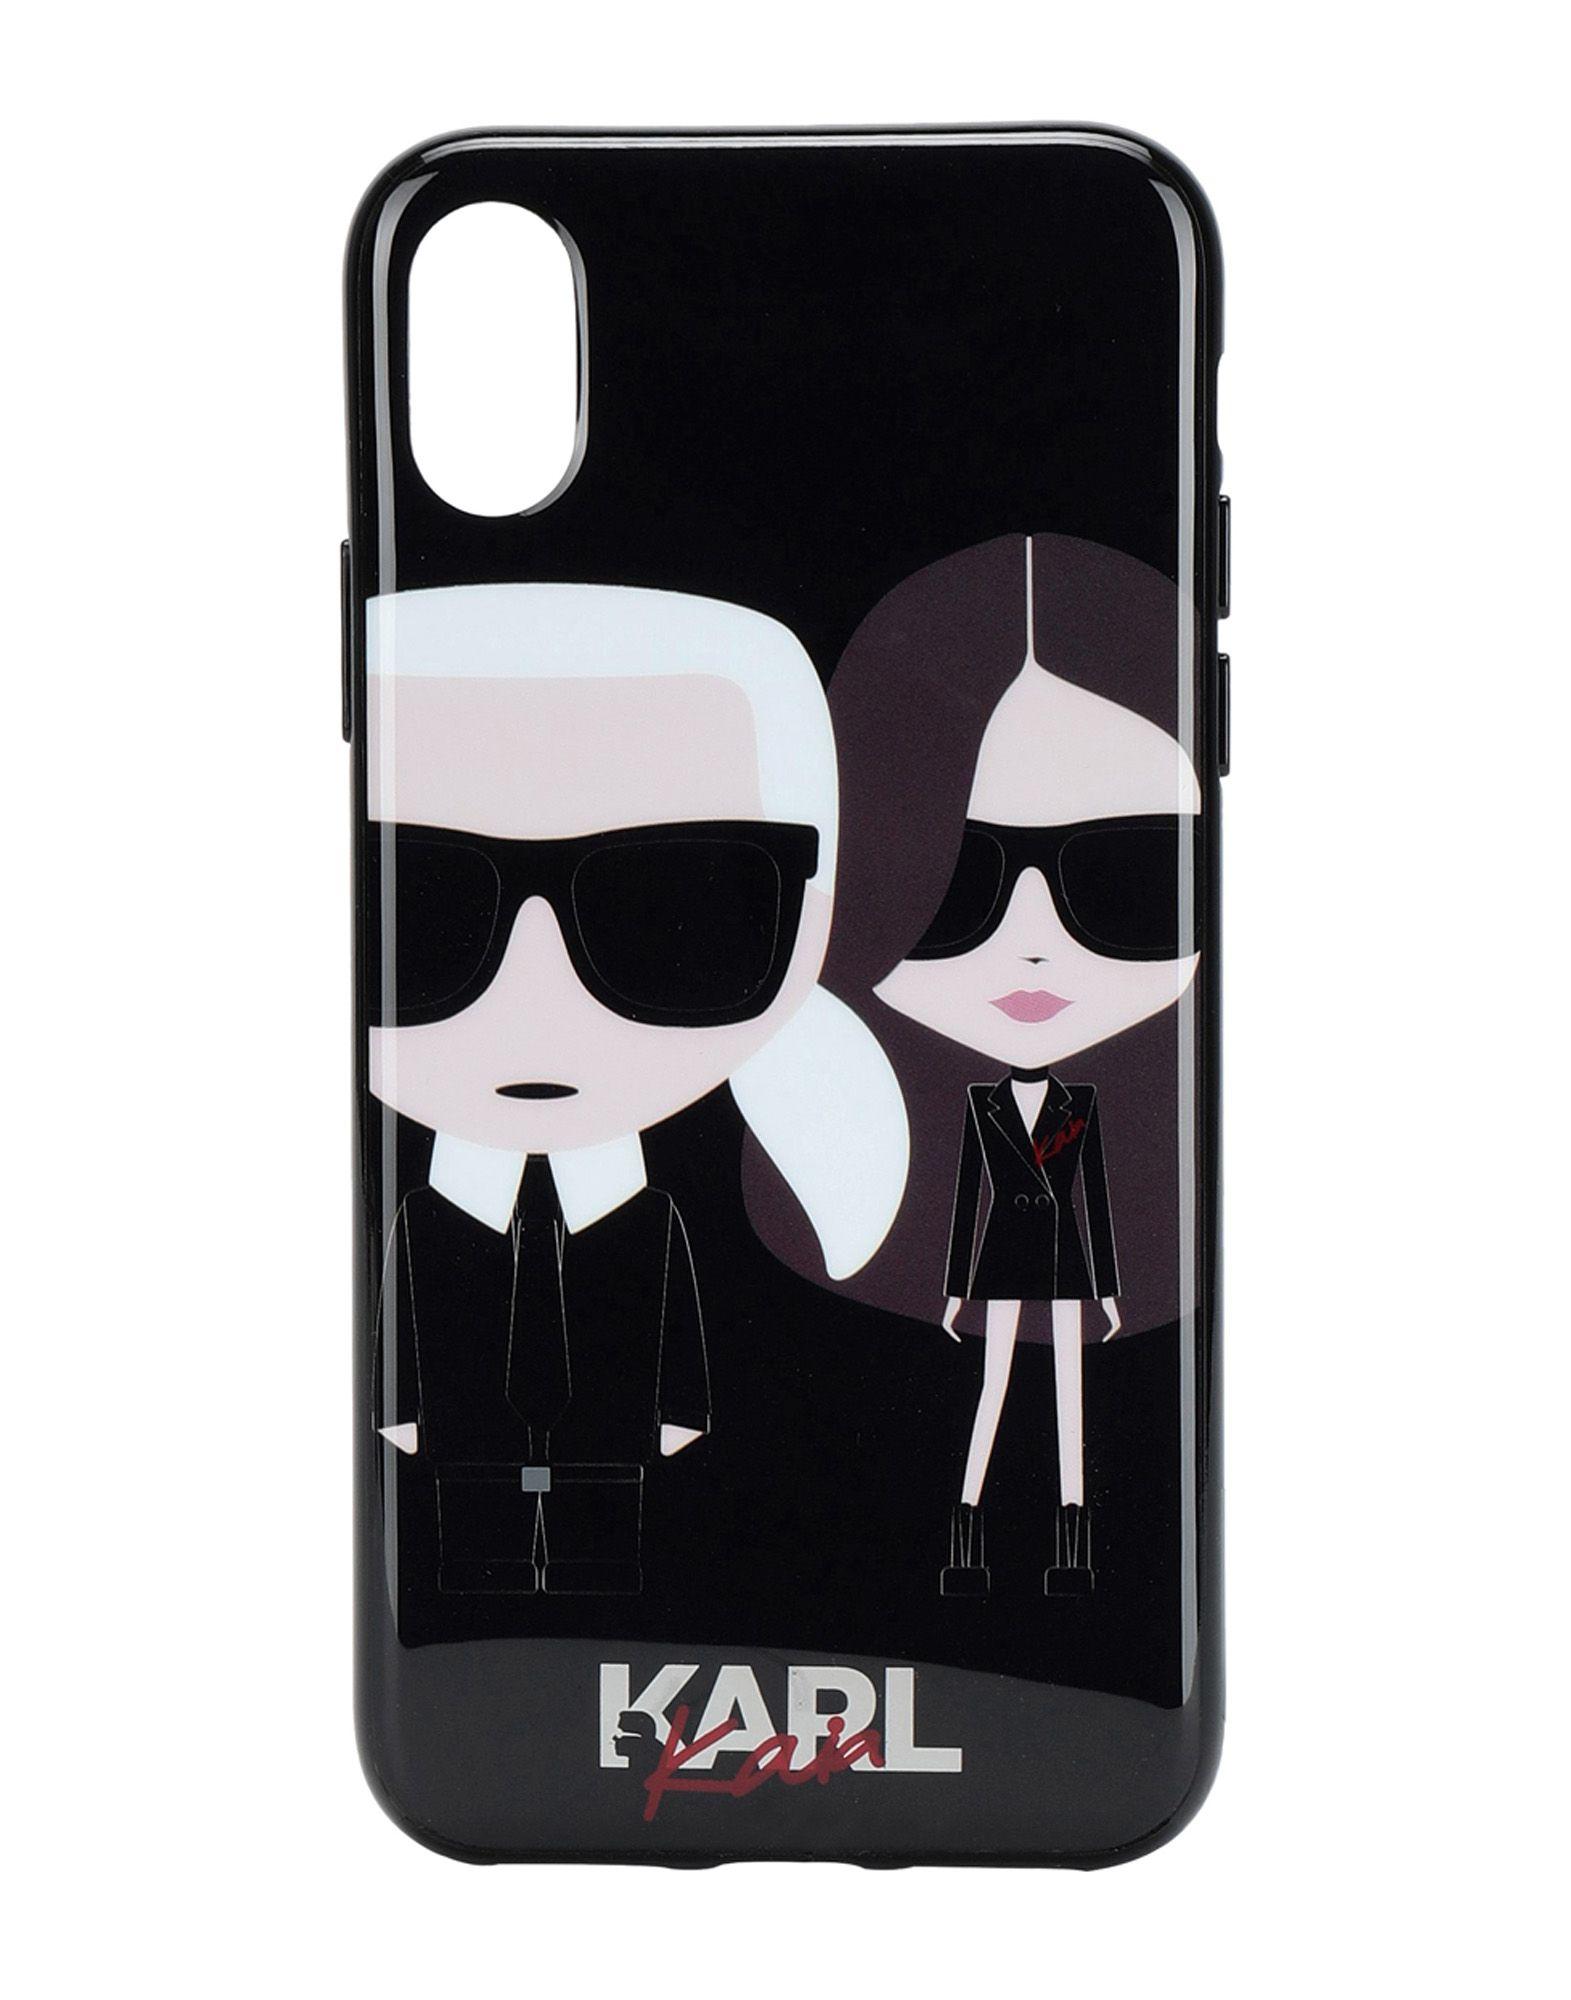 KARL LAGERFELD x KAIA Чехол karl lagerfeld чехол крышка karl lagerfeld case monster для apple iphone 6 силикон черный soft case